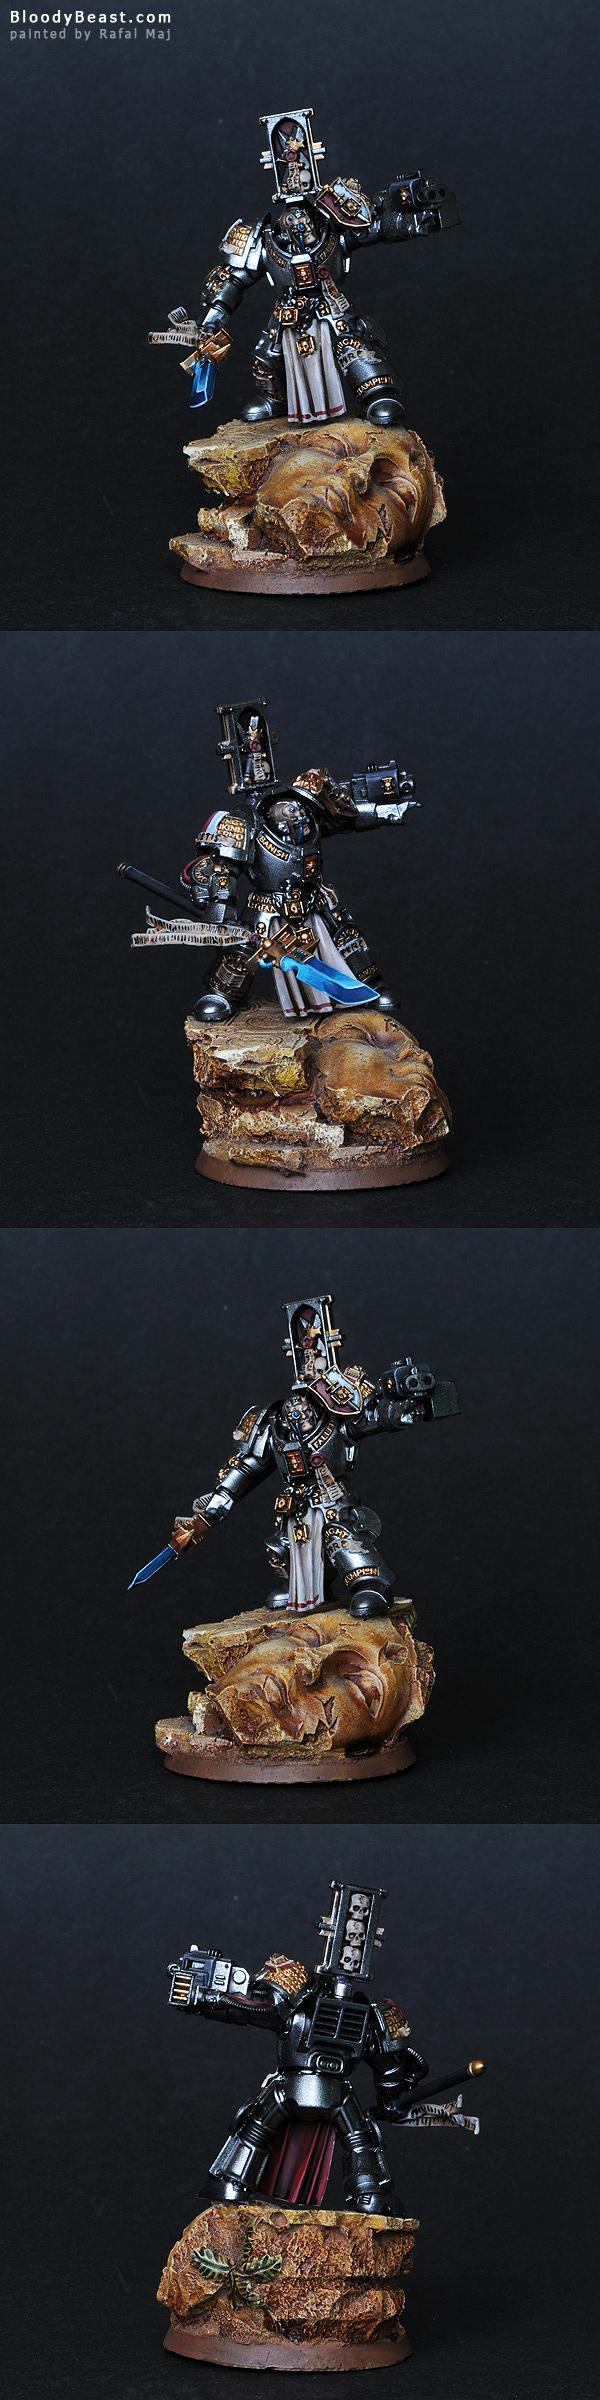 Grey Knight Terminator with Nemesis Force Halberd painted by Rafal Maj (BloodyBeast.com)